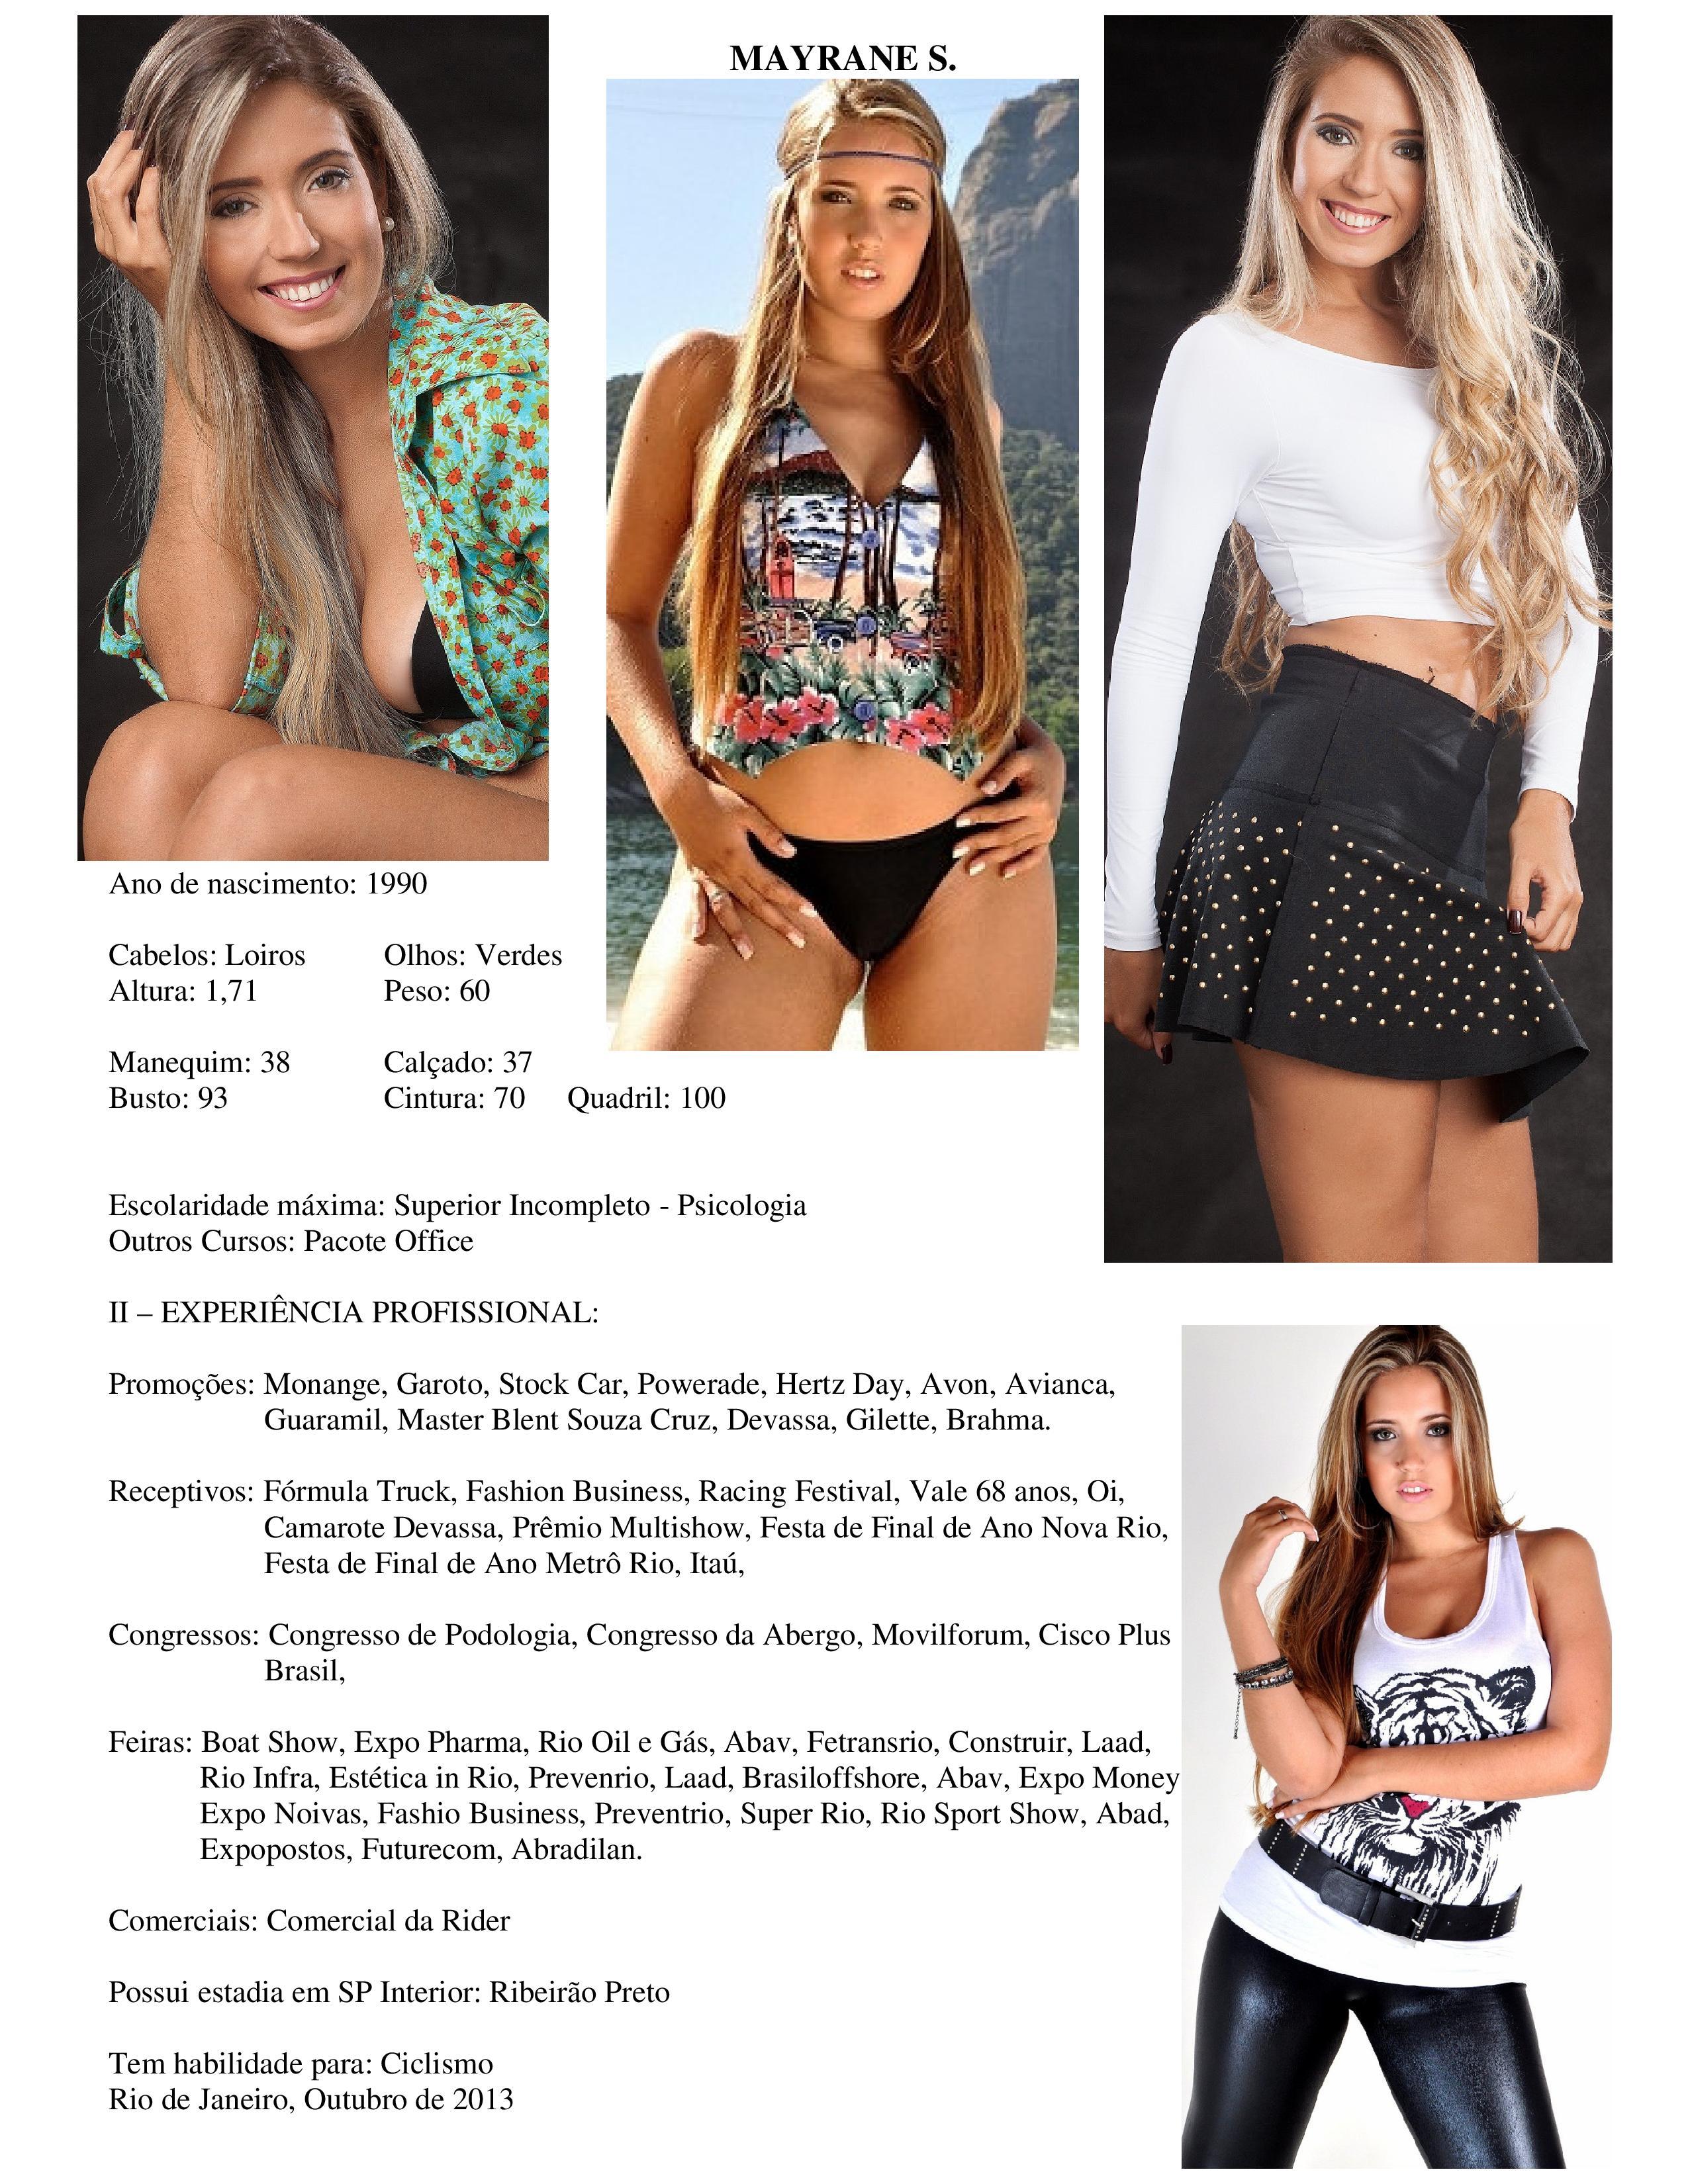 Mayrane Souza-page-001